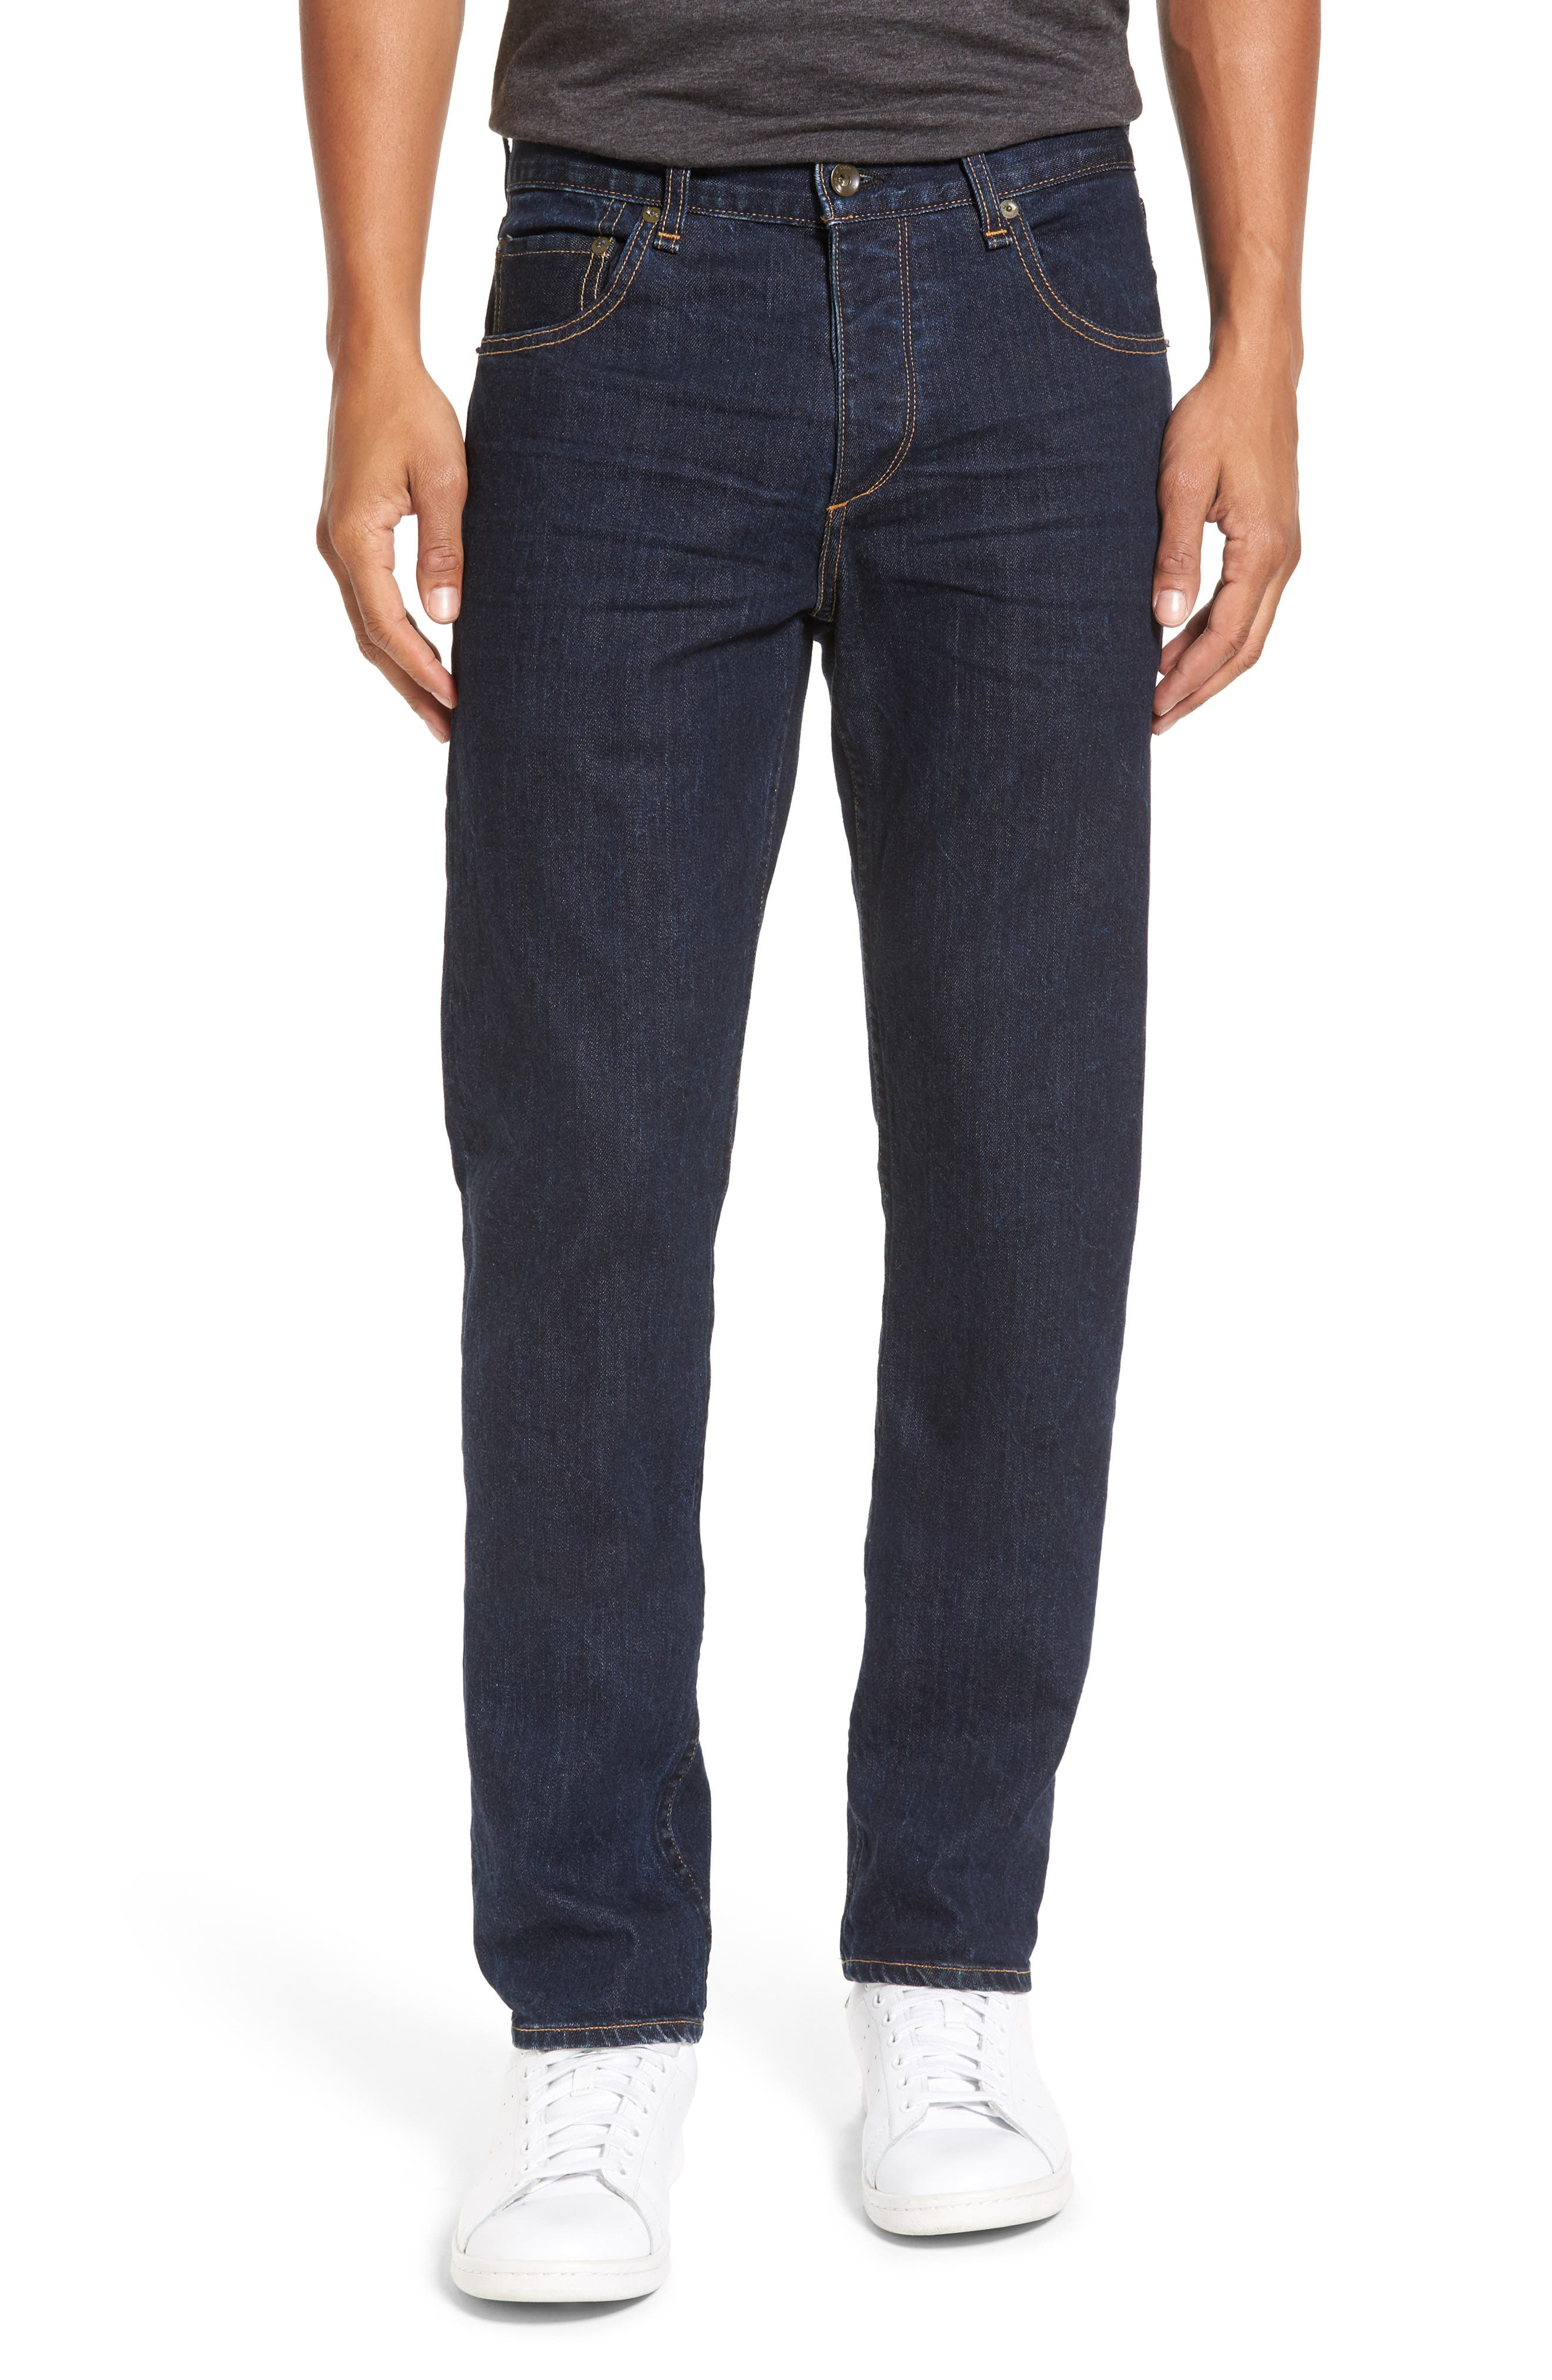 Men's Rag & Bone Standard Issue Fit 3 Slim Straight Leg Jeans